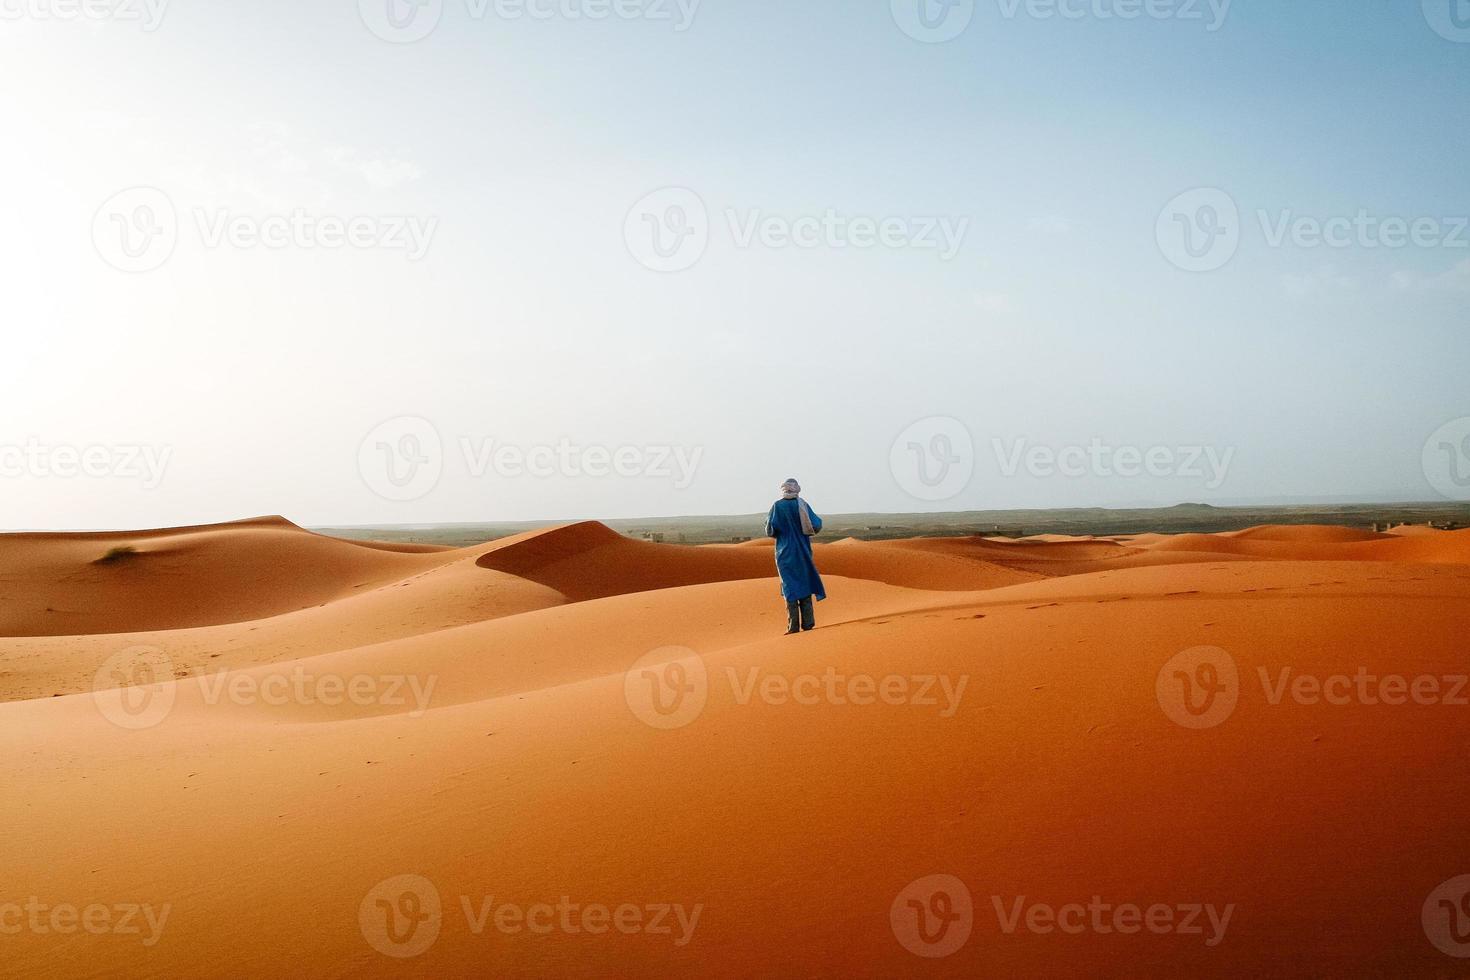 Moroccan Bedouin photo